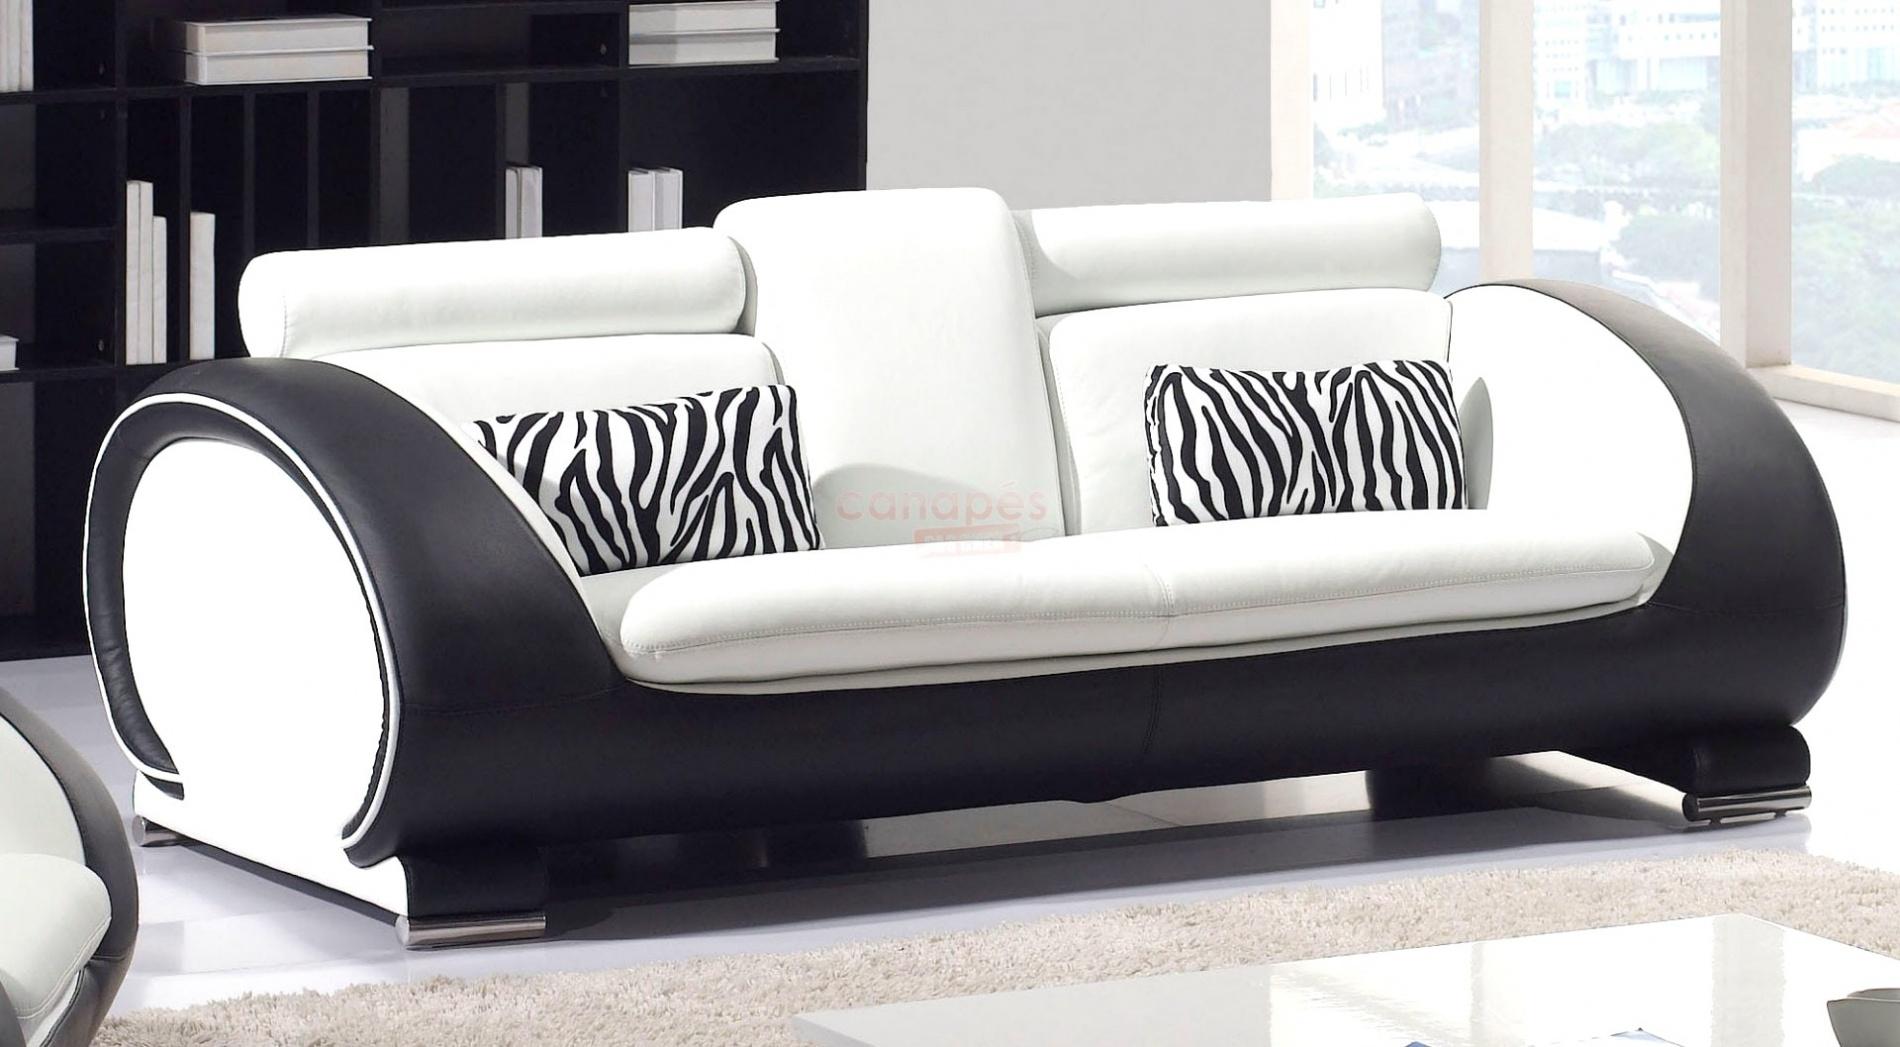 Housse Canapé Angle Conforama Élégant Stock Maha S Couch 4 Places Home Mahagranda